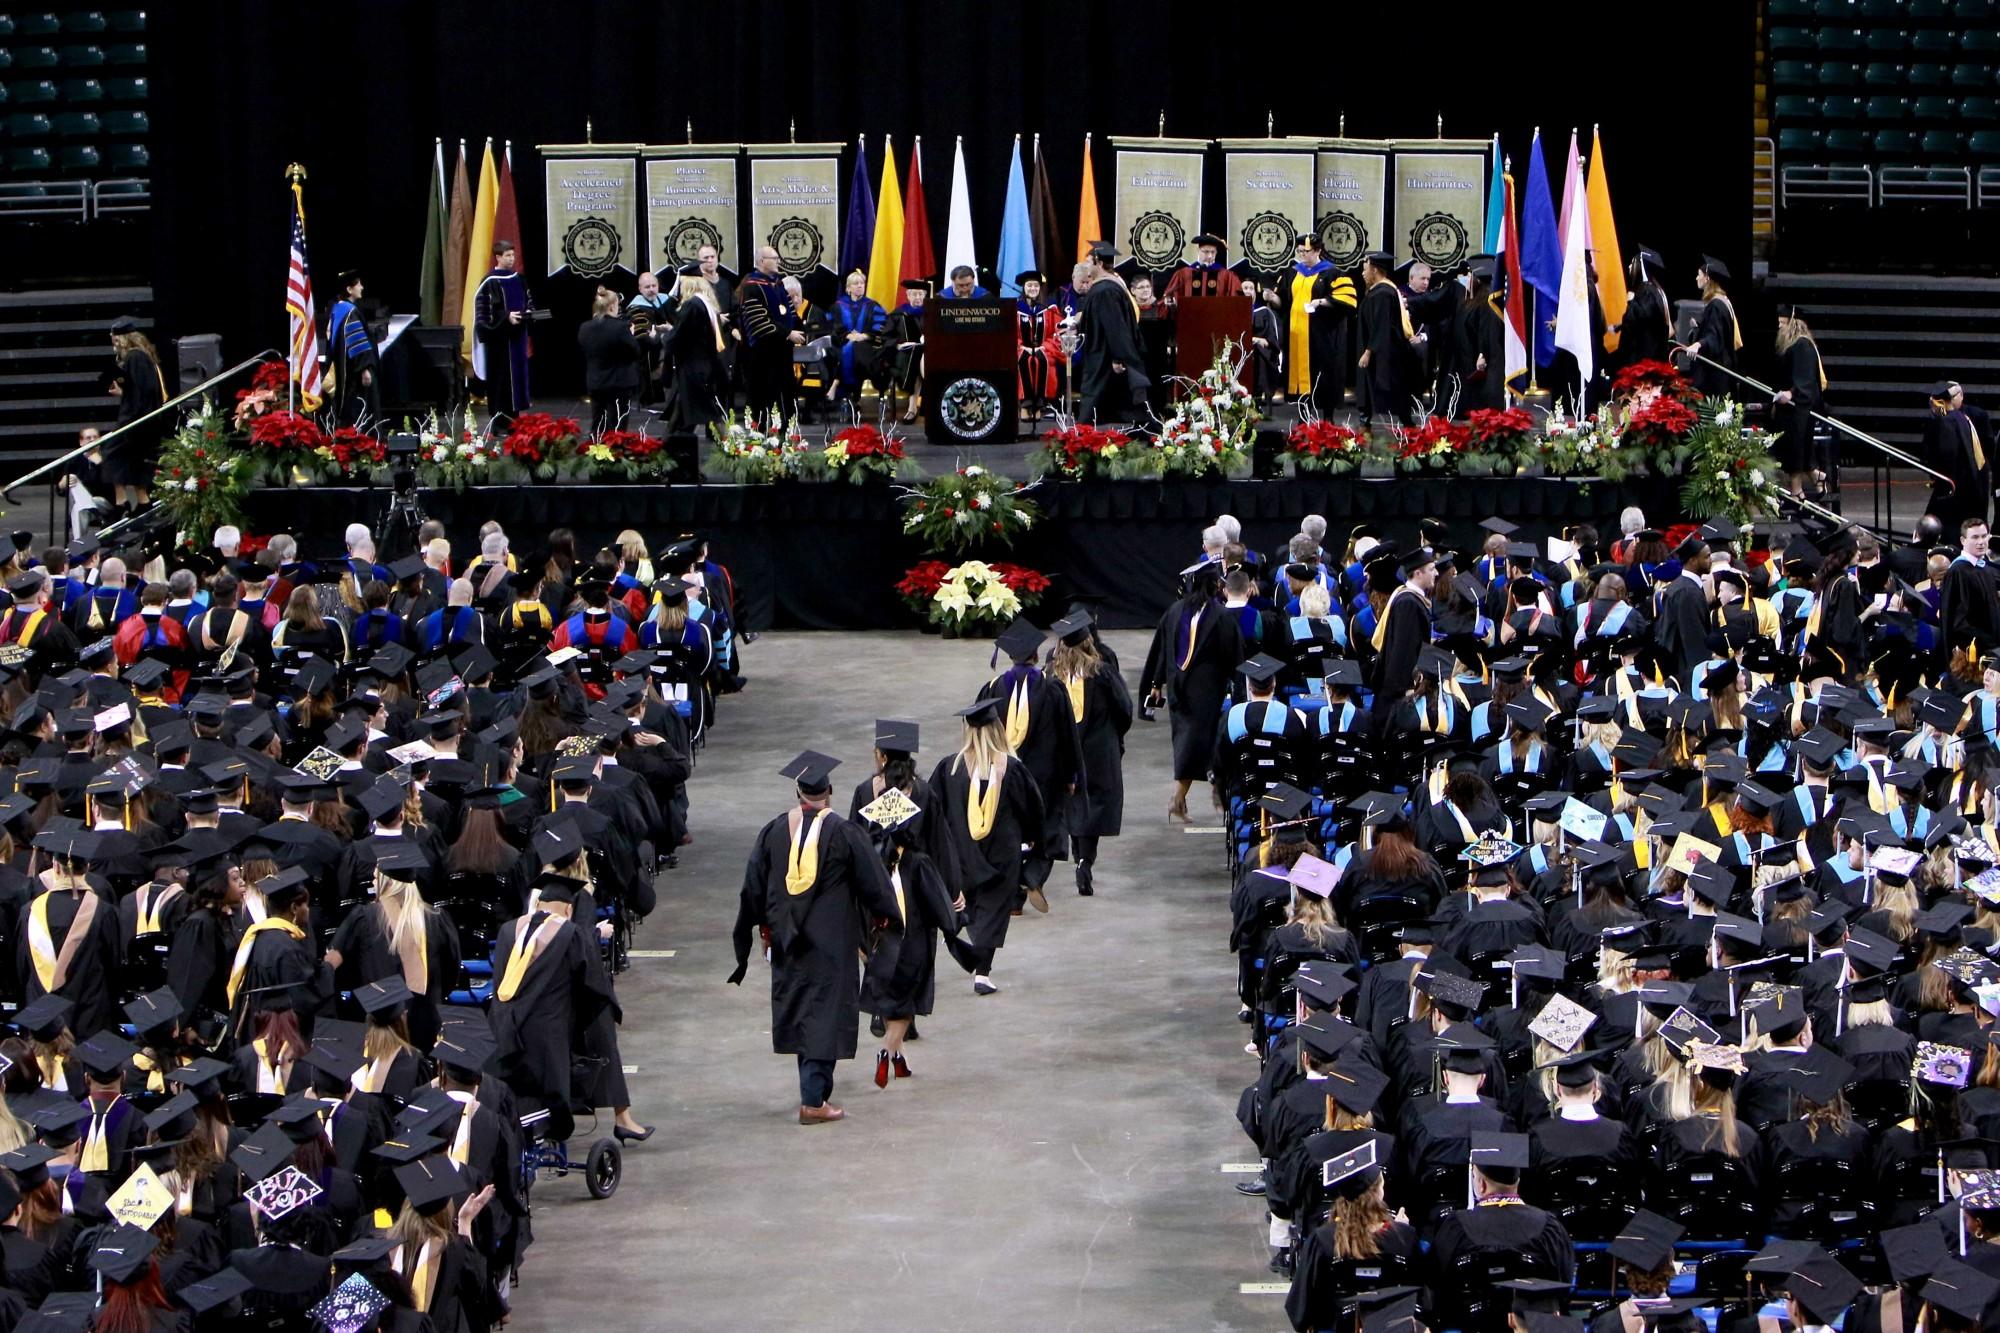 Lindenwood University Commencement (Graduation) | Lindenwood University